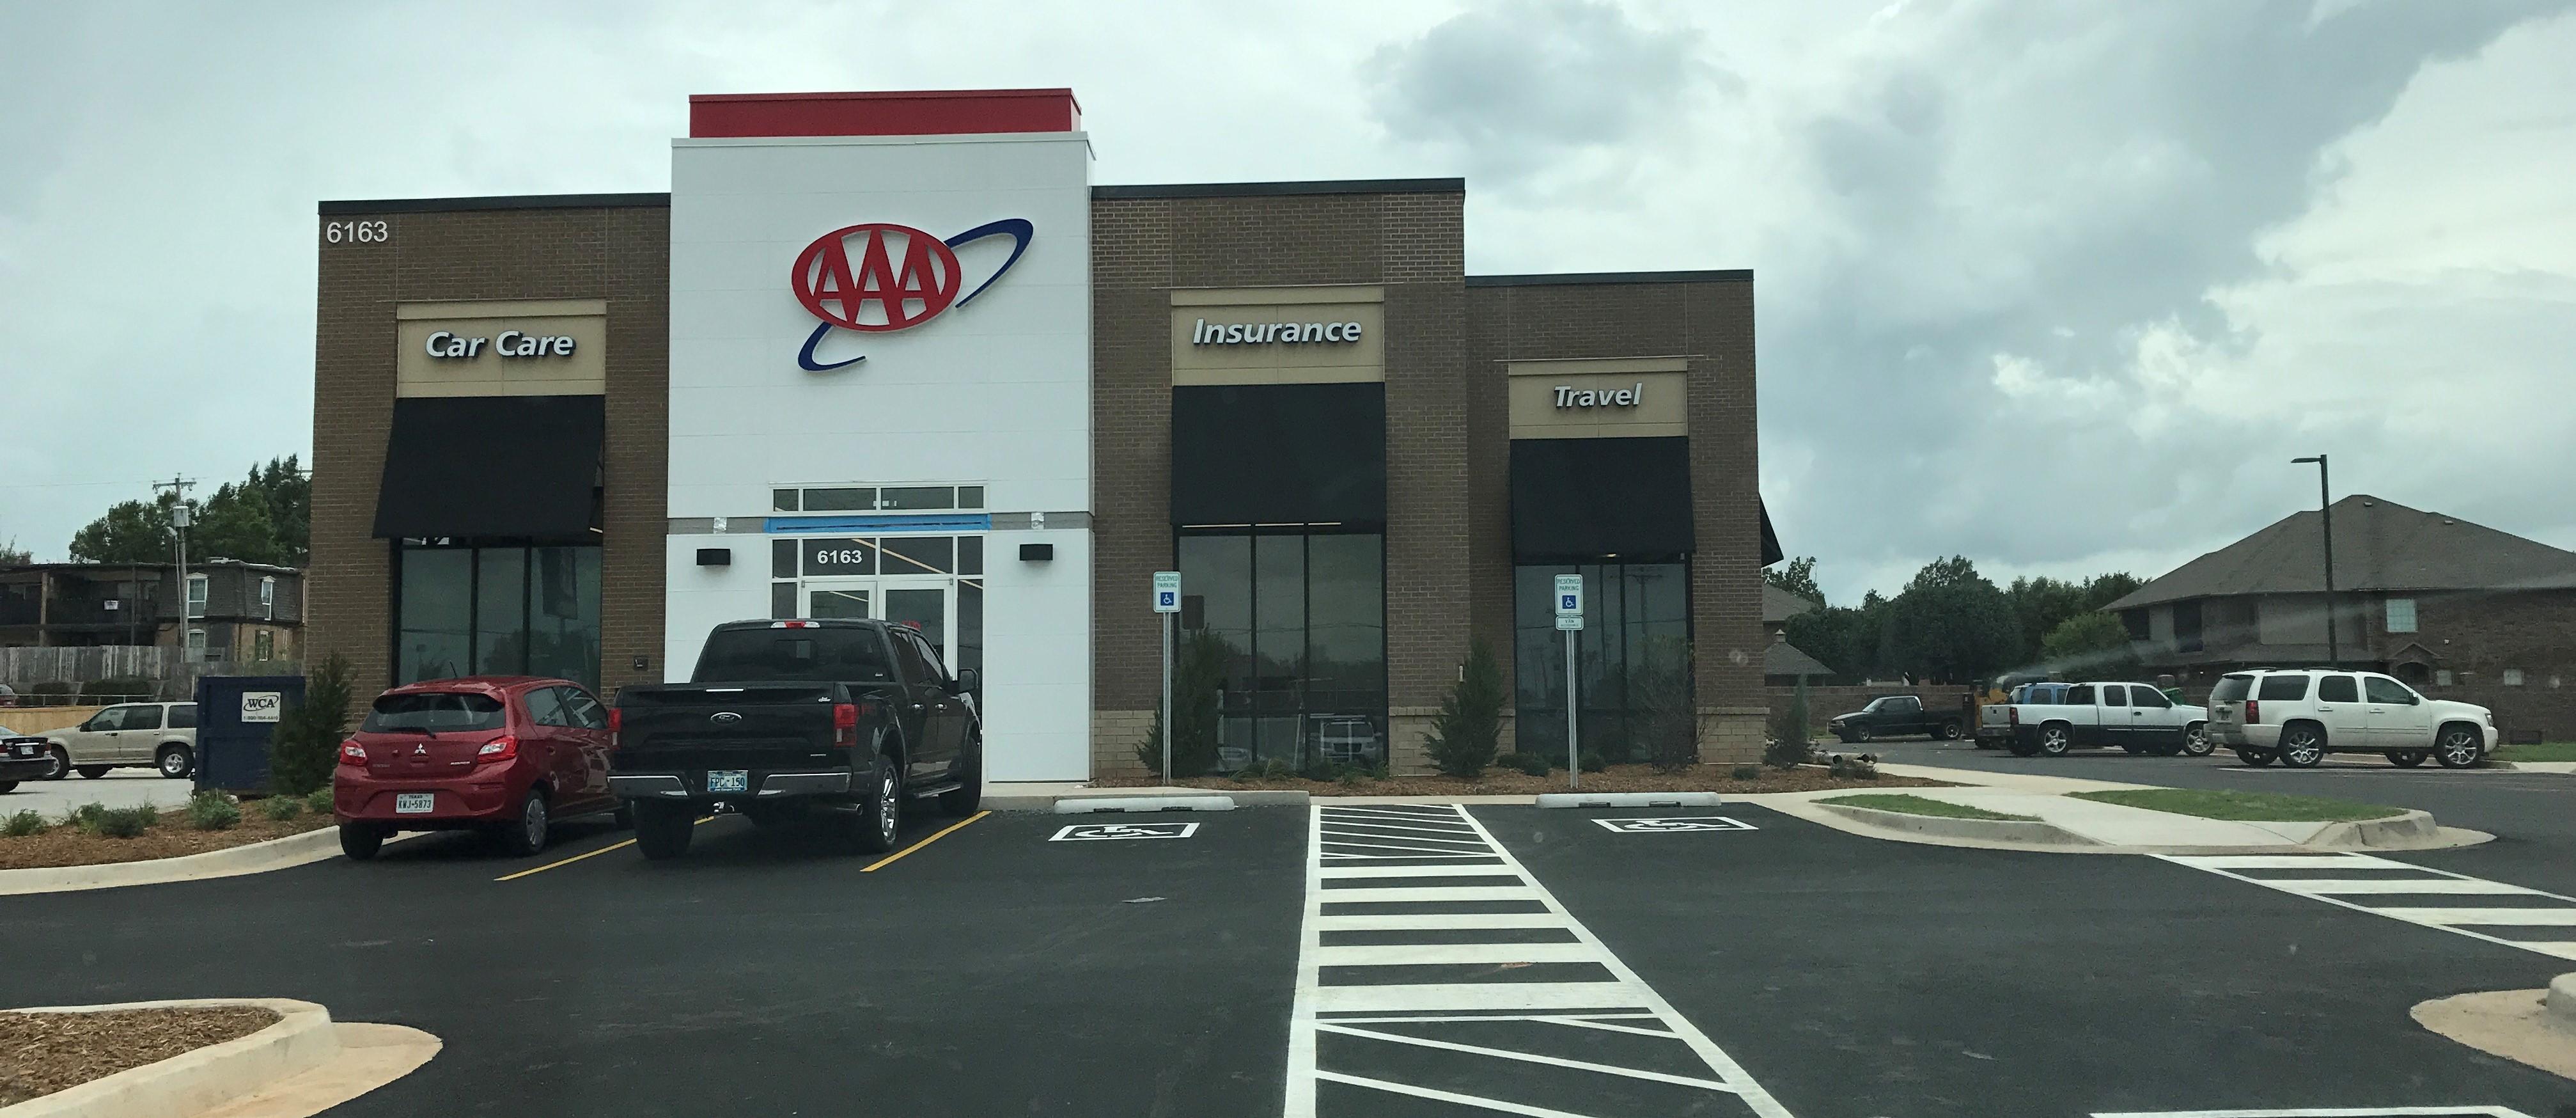 Aaa Auto Club Near Me >> Aaa Adds Car Care To Customer Experience